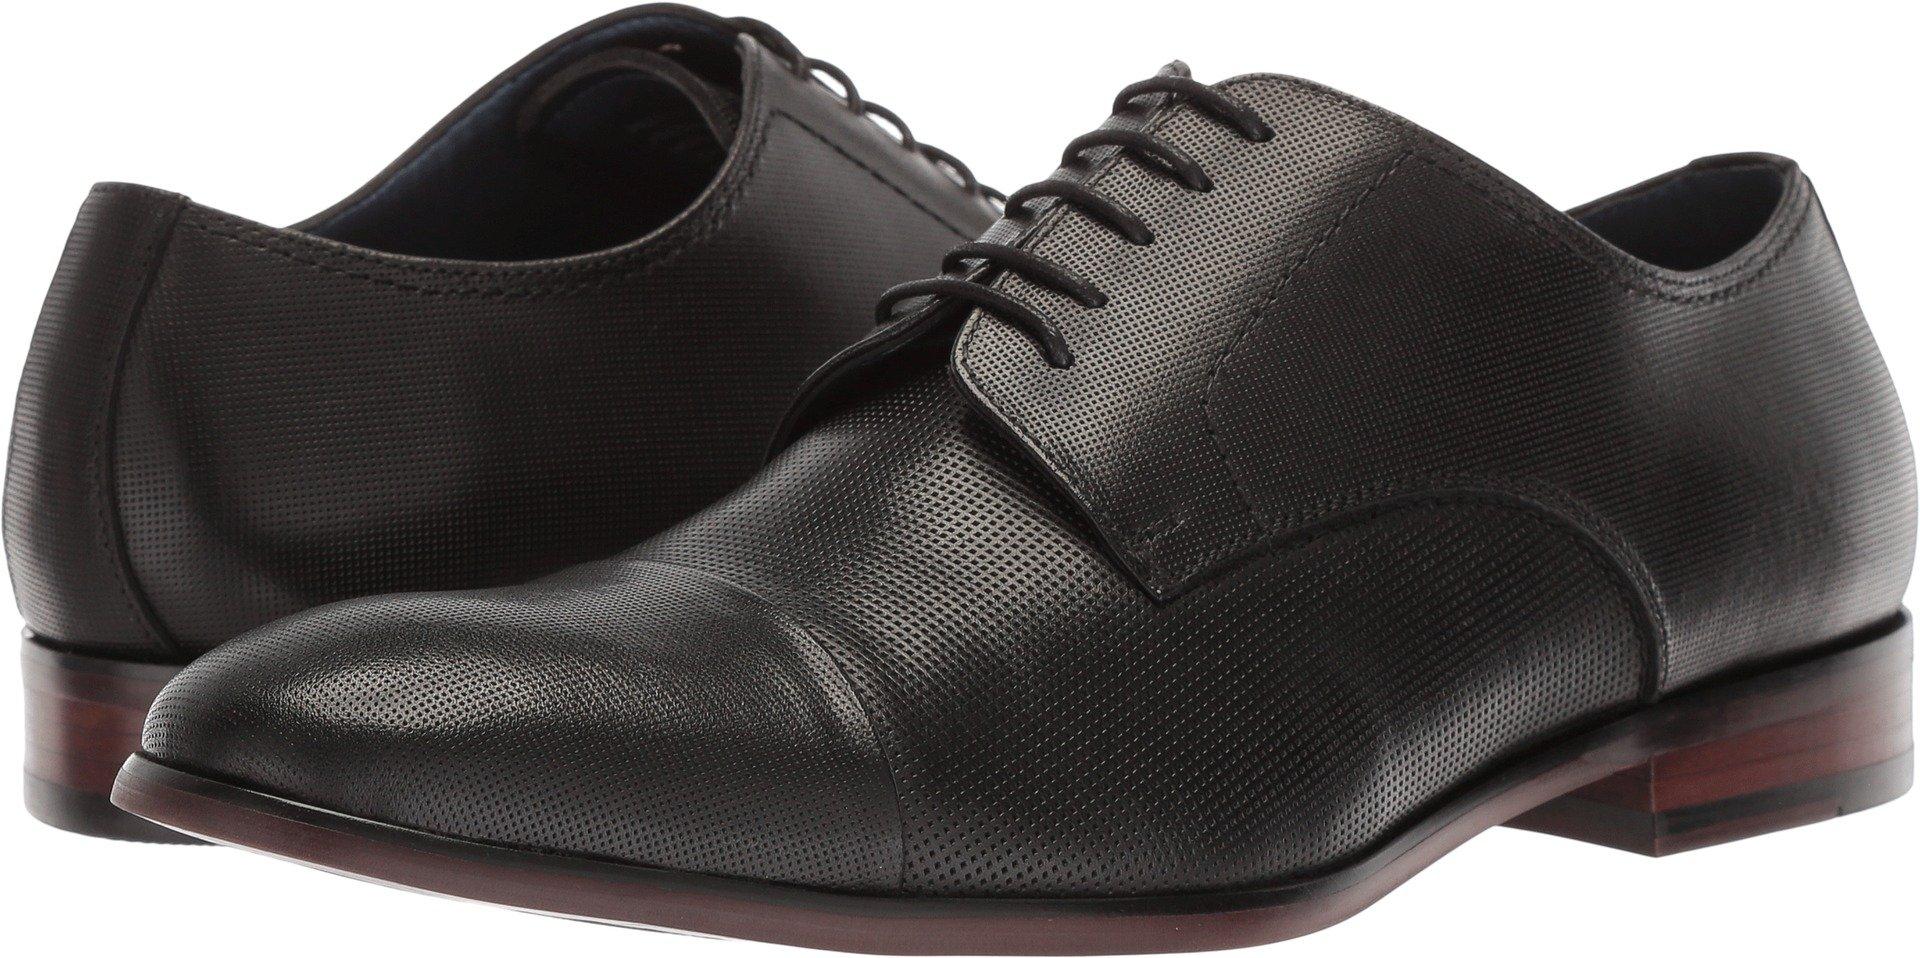 Steve Madden Men's Preston Oxford, Black Leather, 8.5 M US